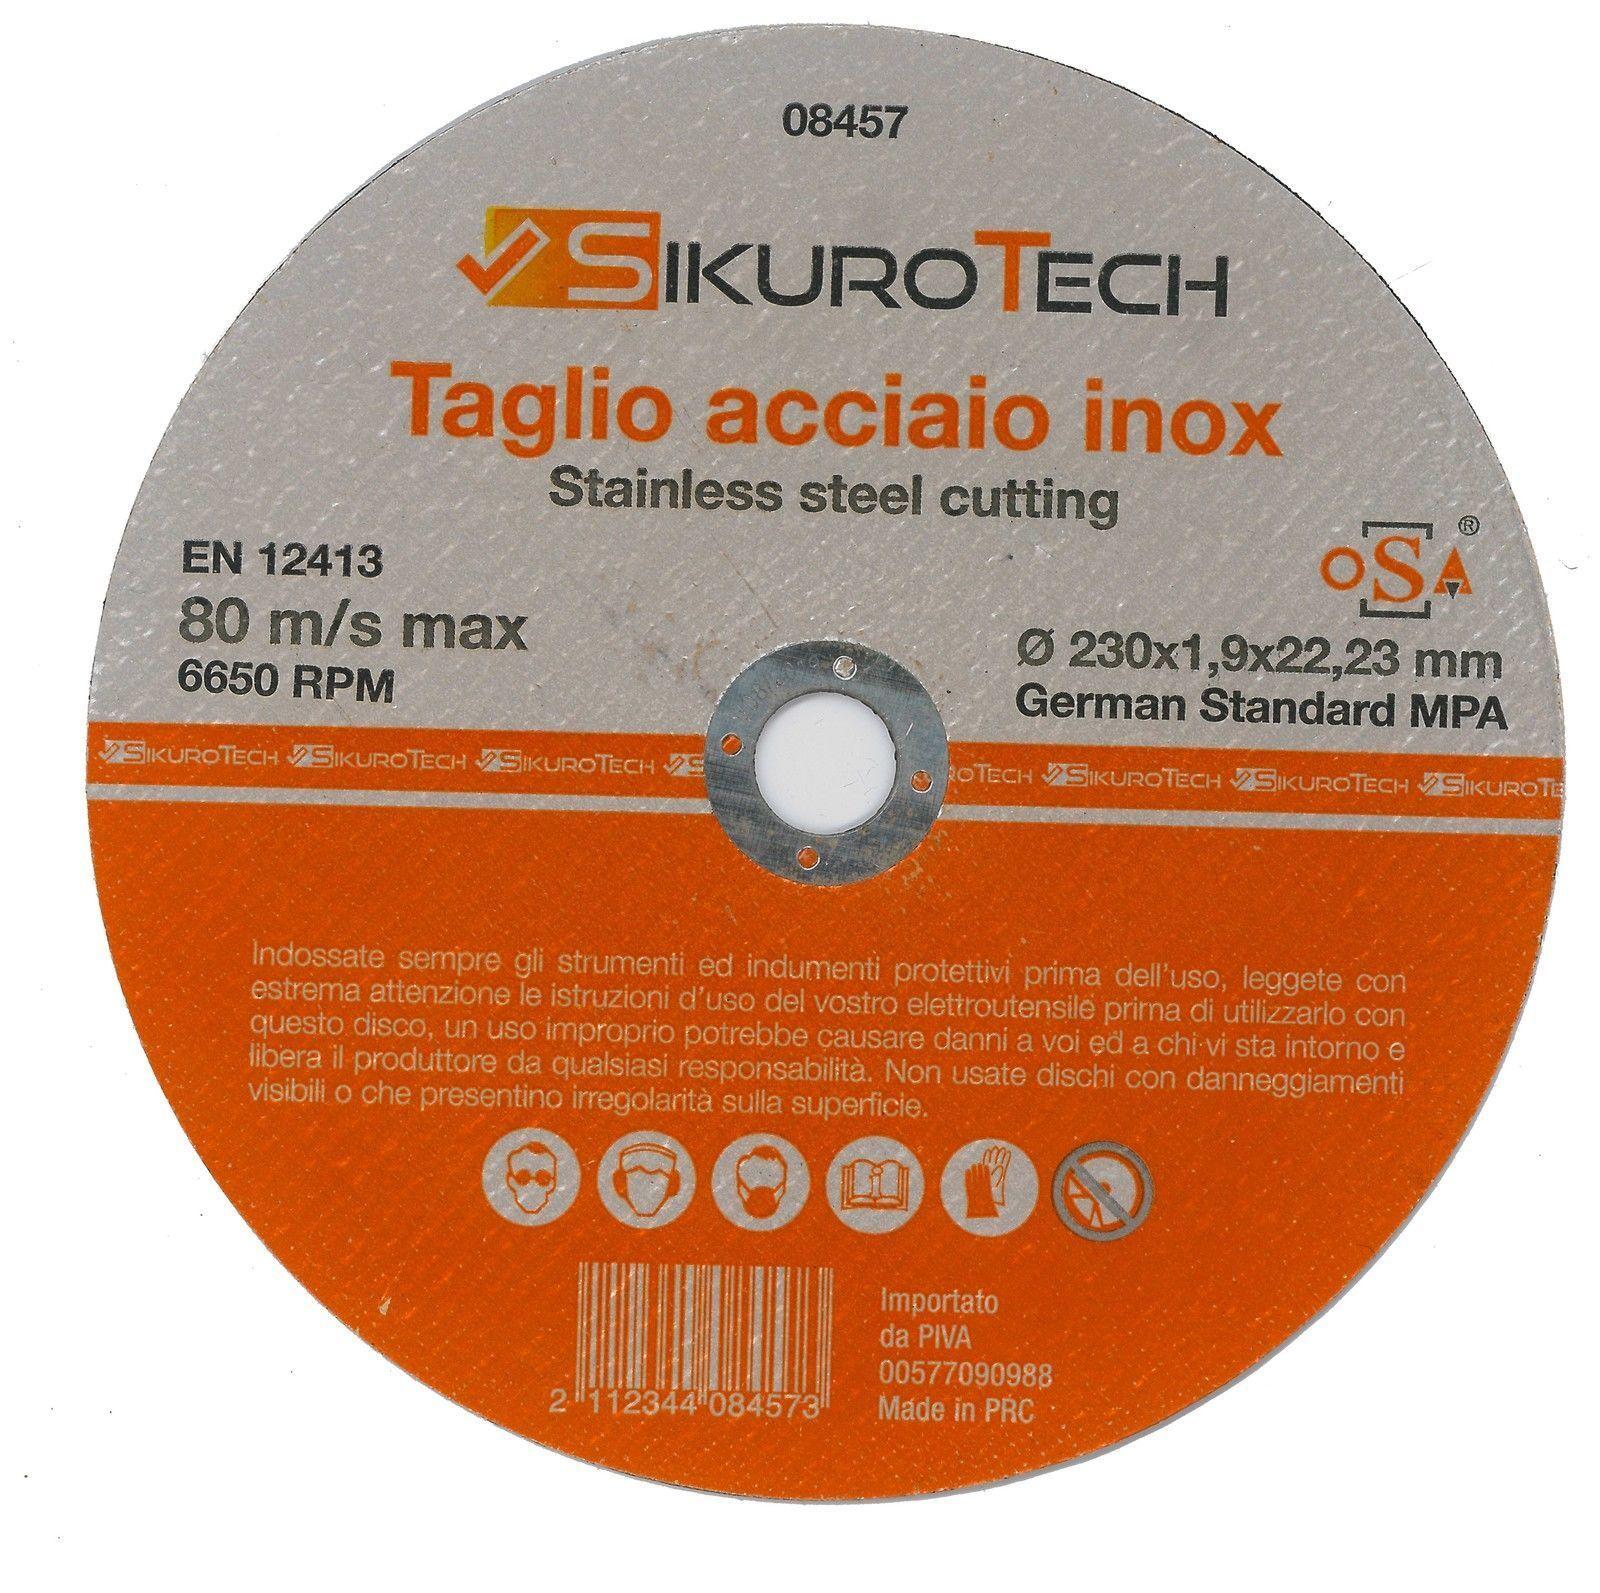 Disco Taglio Ferro Inox 230x1,9x22,23mm Smerigliatrice High Quality Alta Qualità